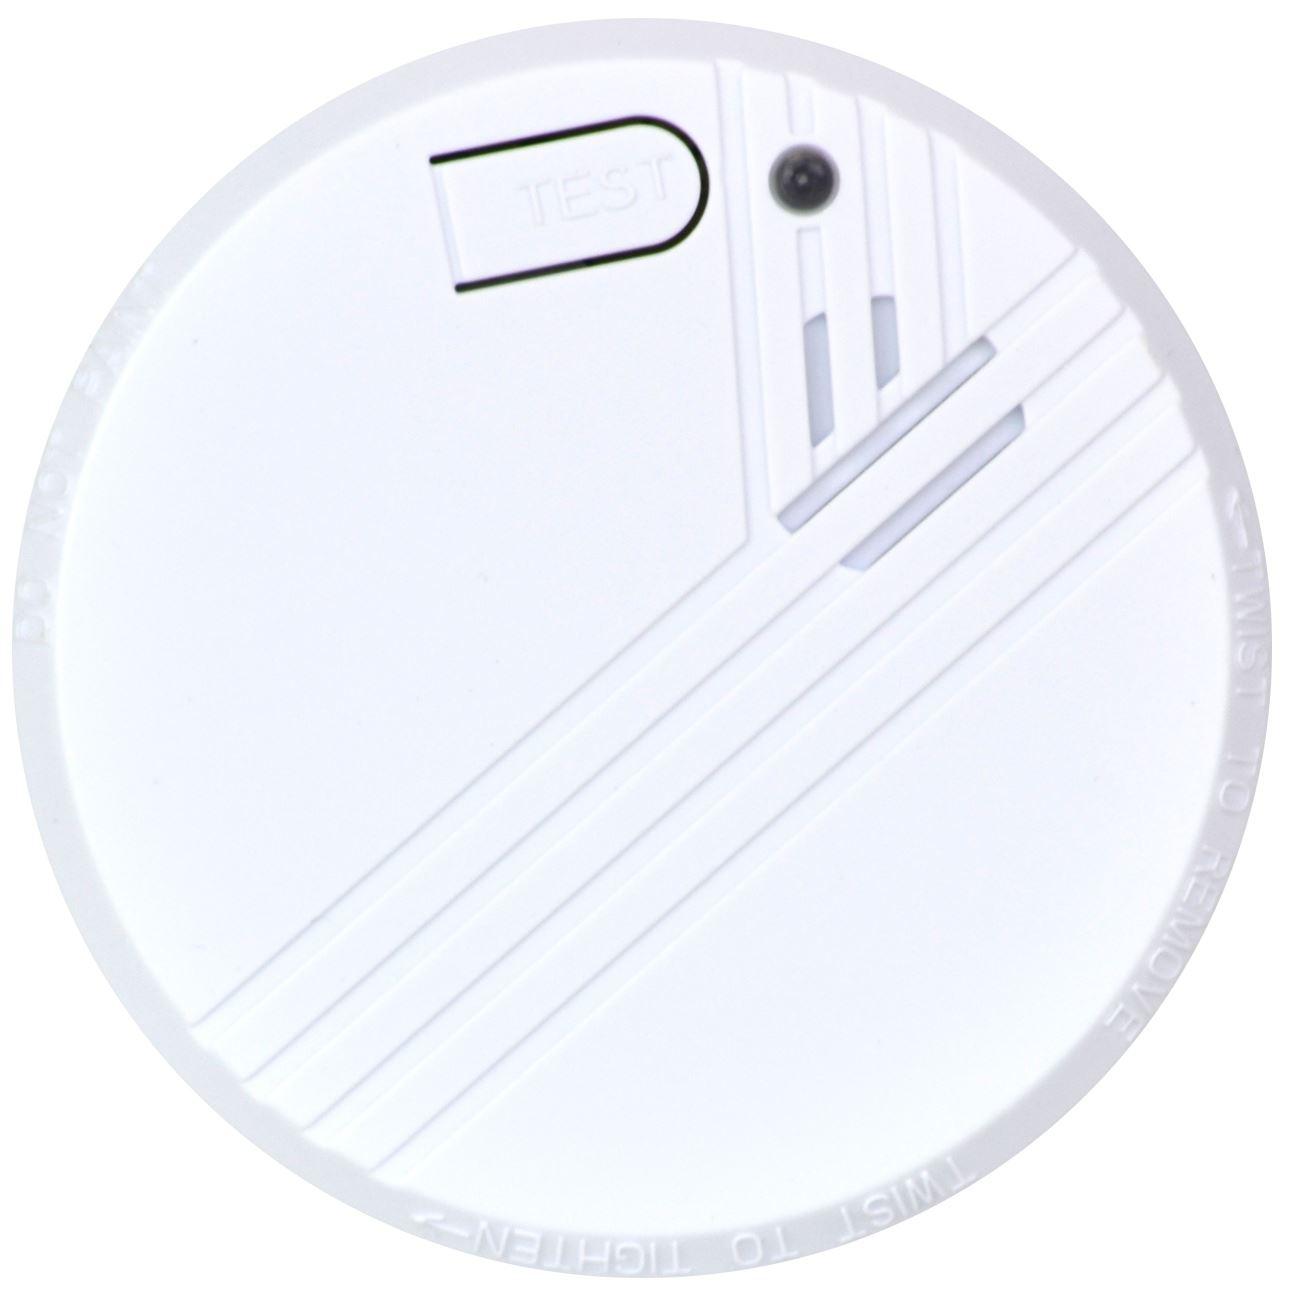 Aa Photoelectric Smoke Fire Alarm Detectors Batteries